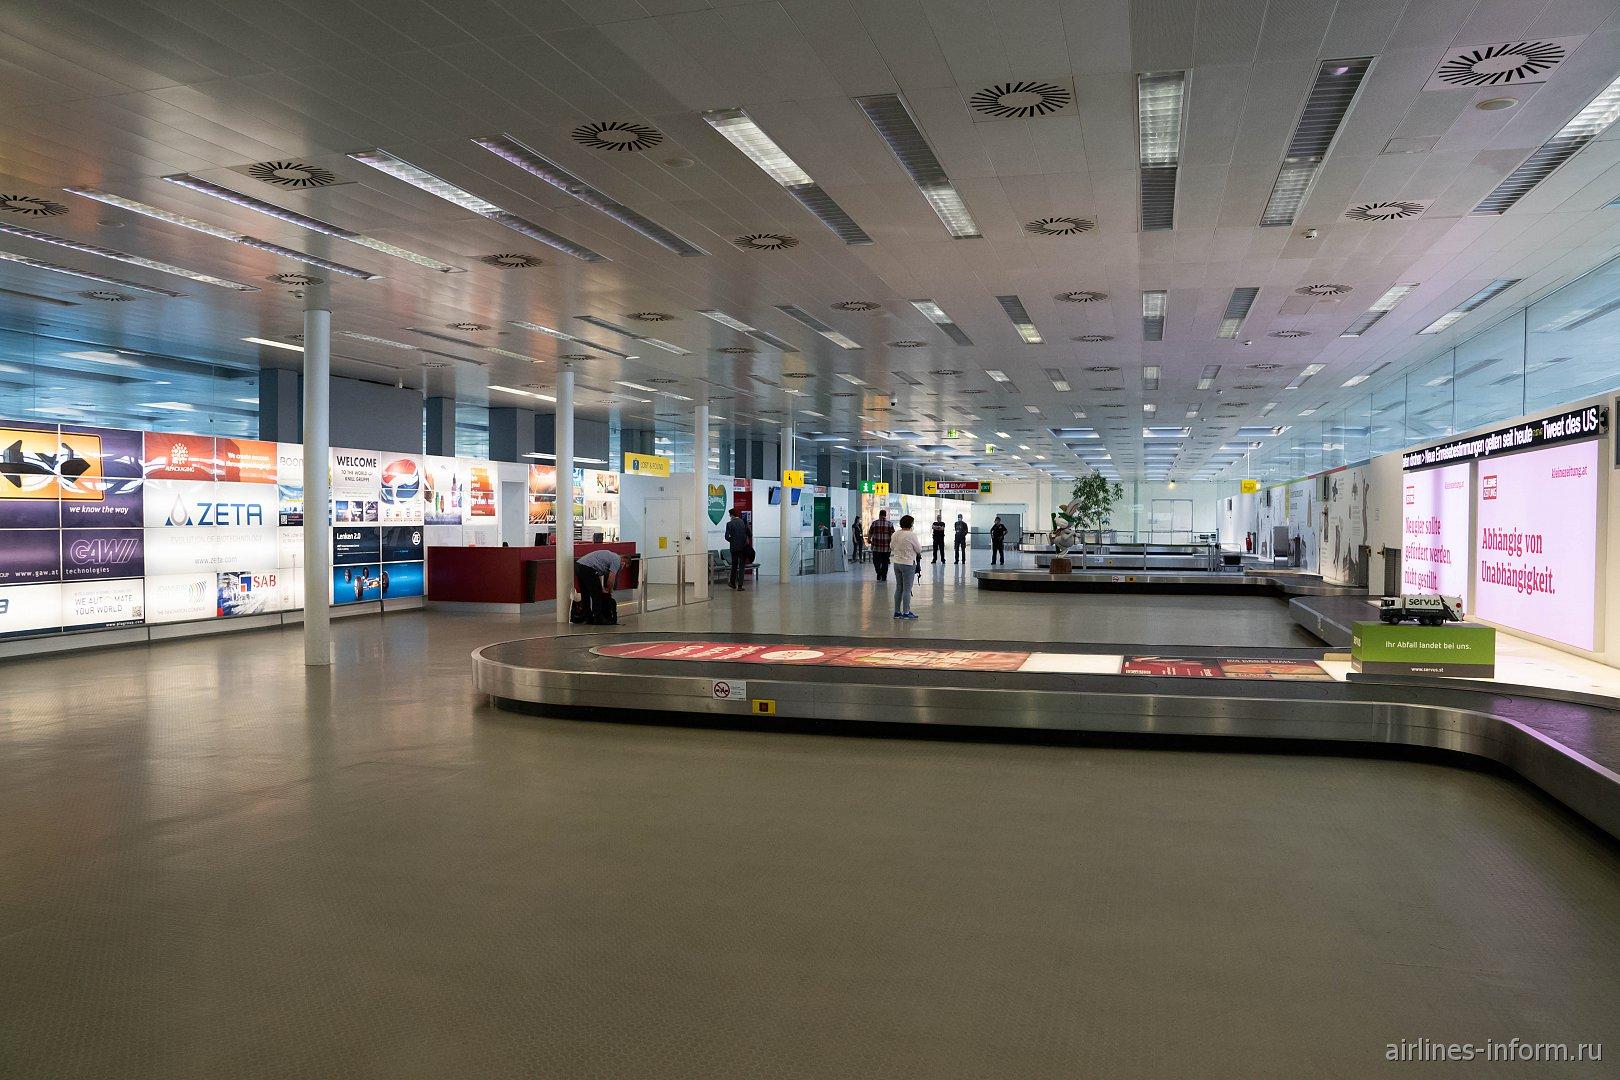 Зал выдачи багажа в аэропорту Грац Талерхоф